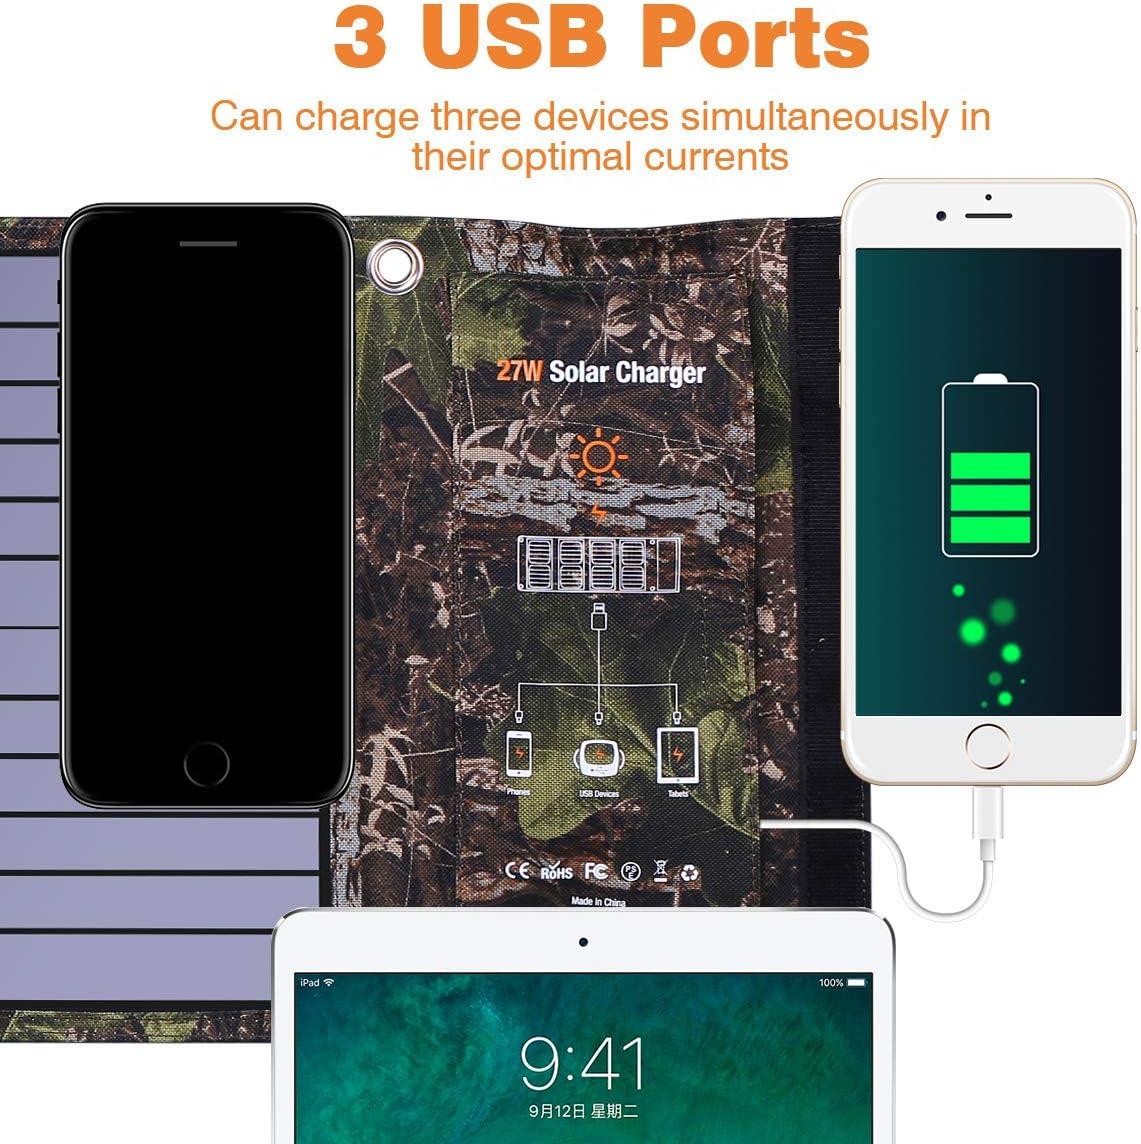 20W USB faltbare Solar Panel Power Bank Outdoor Camping Wandern Ladegerät G3J7